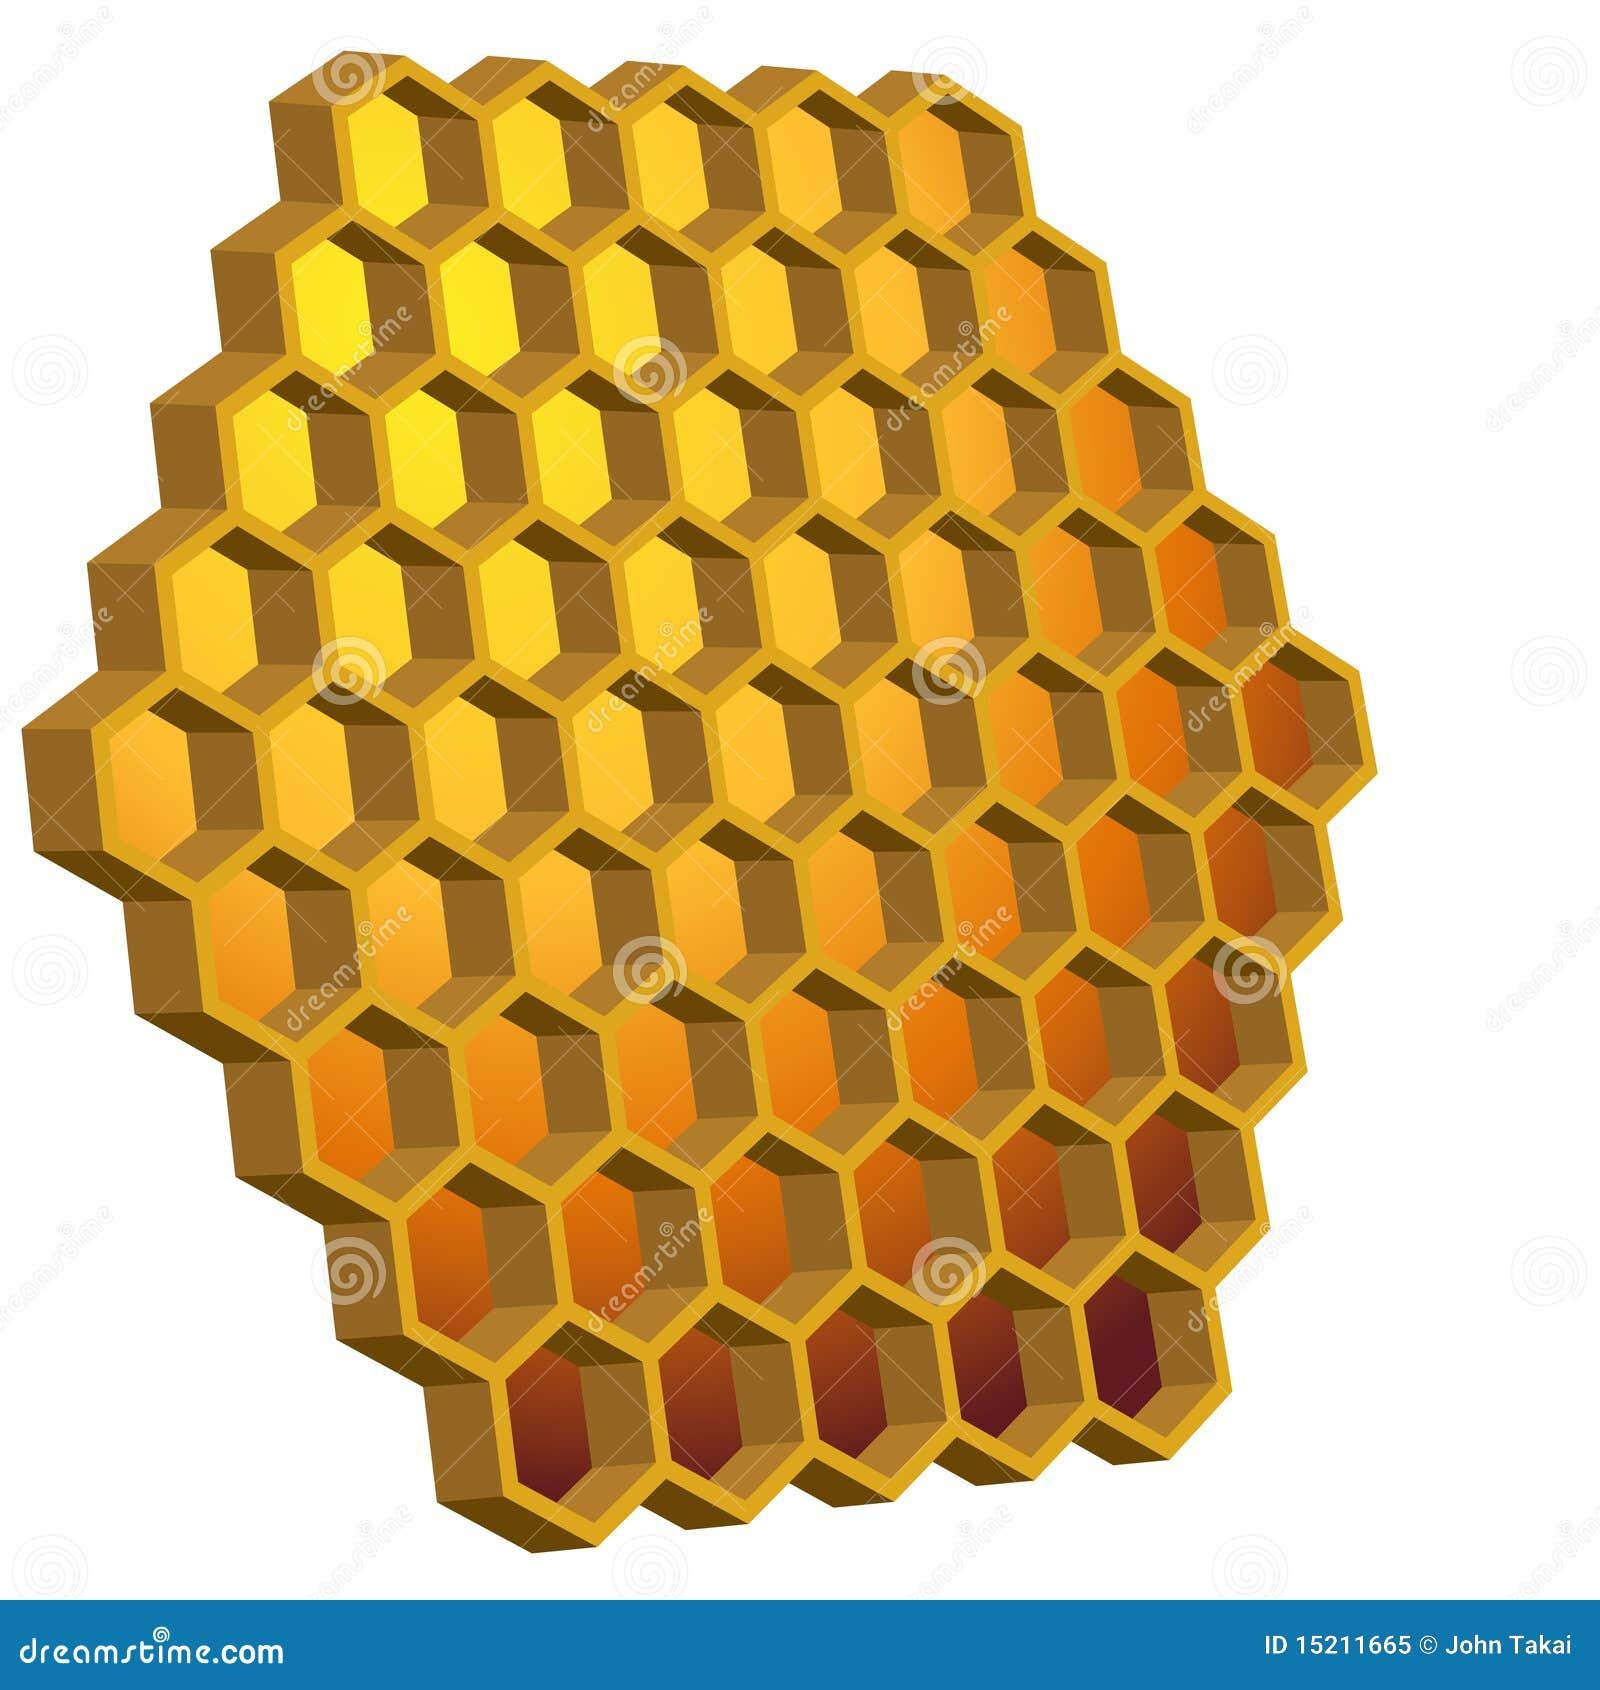 A Sample Honey Bee Farm Business Plan Template